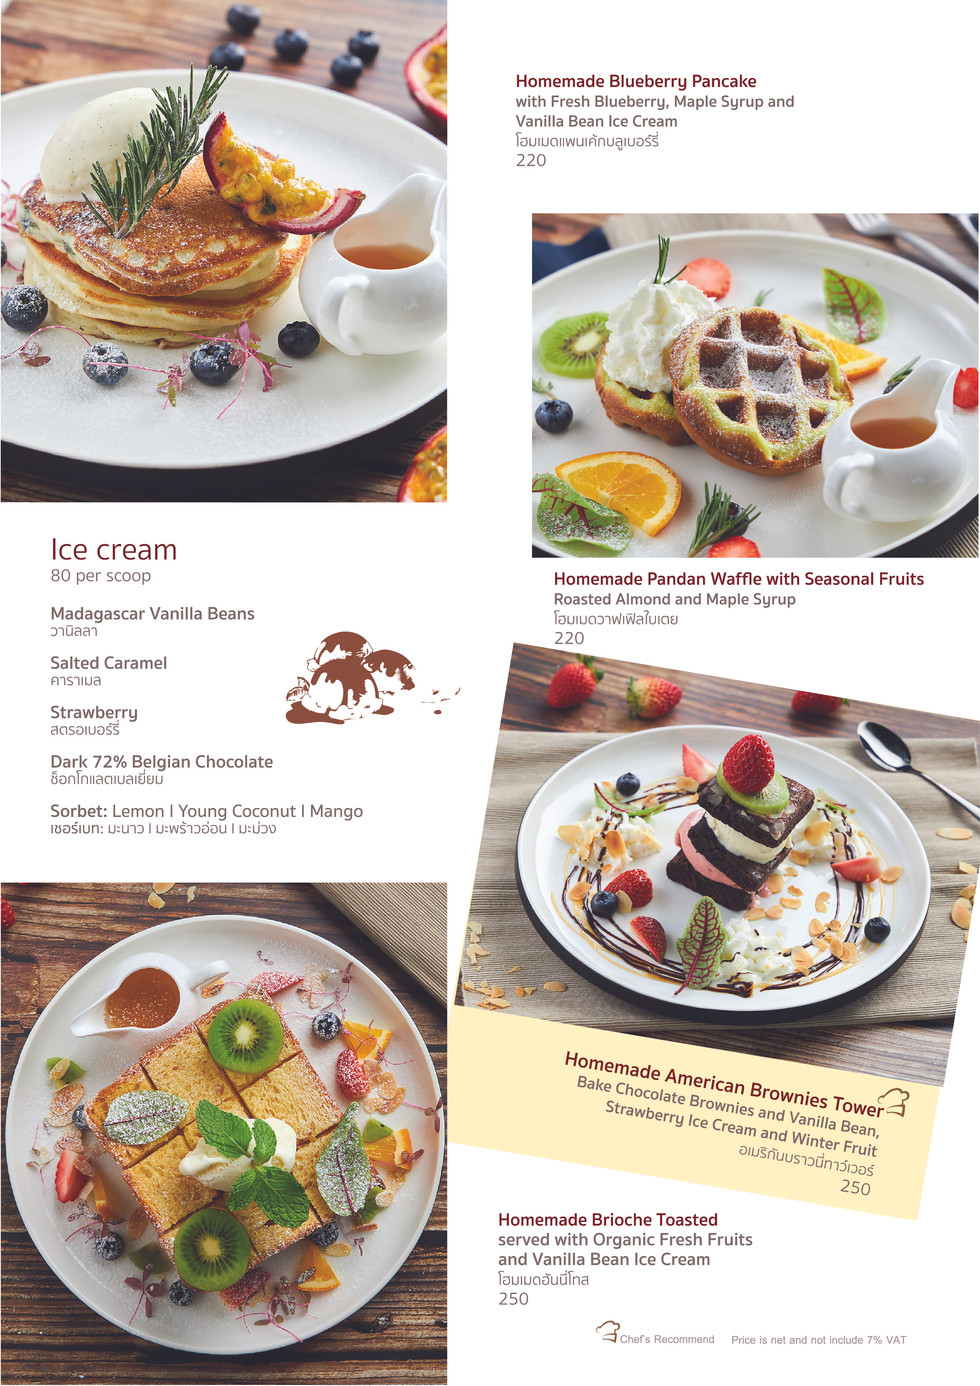 ivc new menu-11.jpg